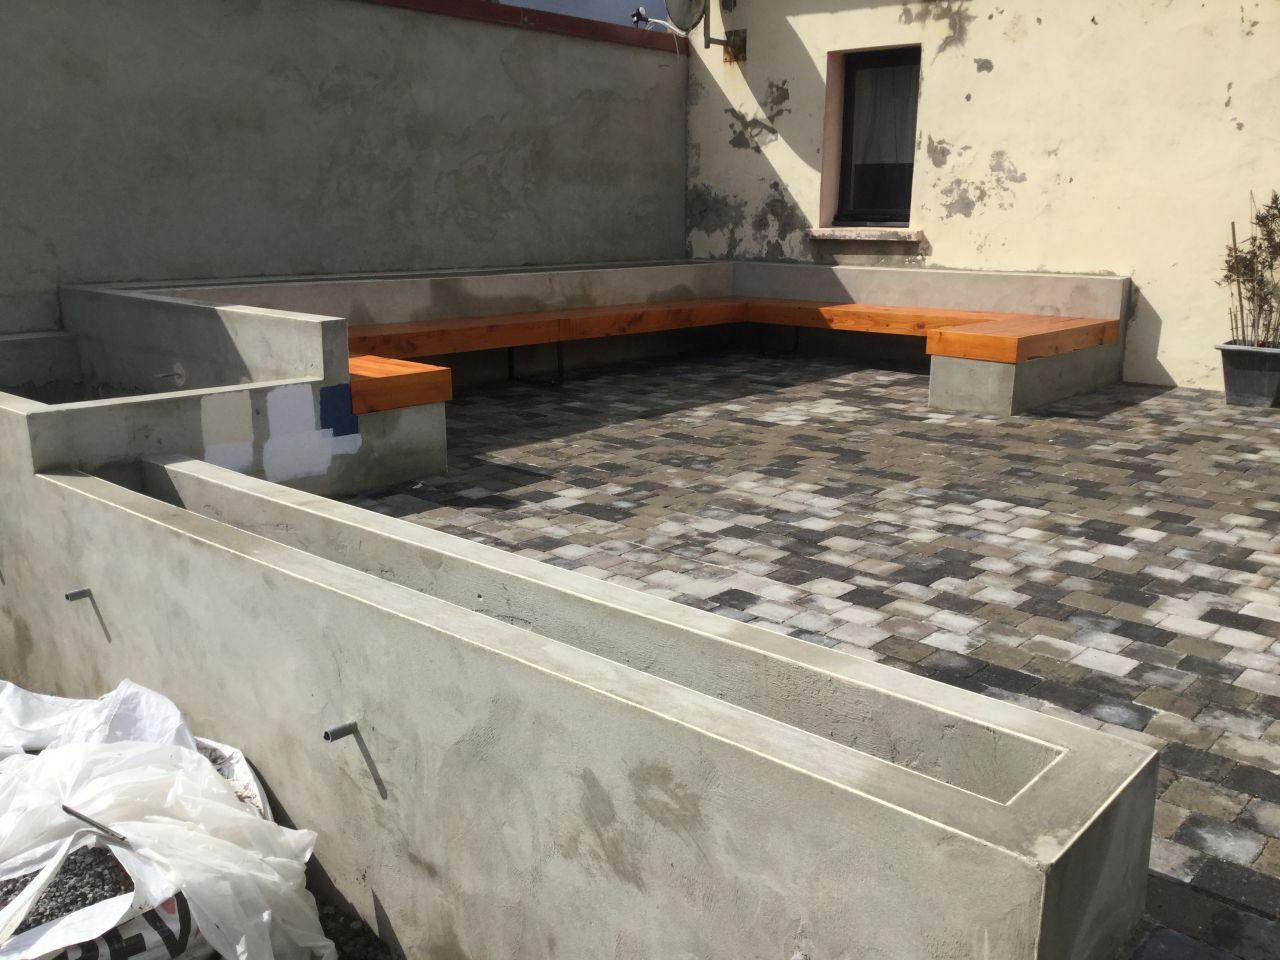 Idee jardiniere terrasse jardini re en bois carr e essencia 40 x 40 x 39 5 cm - Etancheite jardiniere beton ...